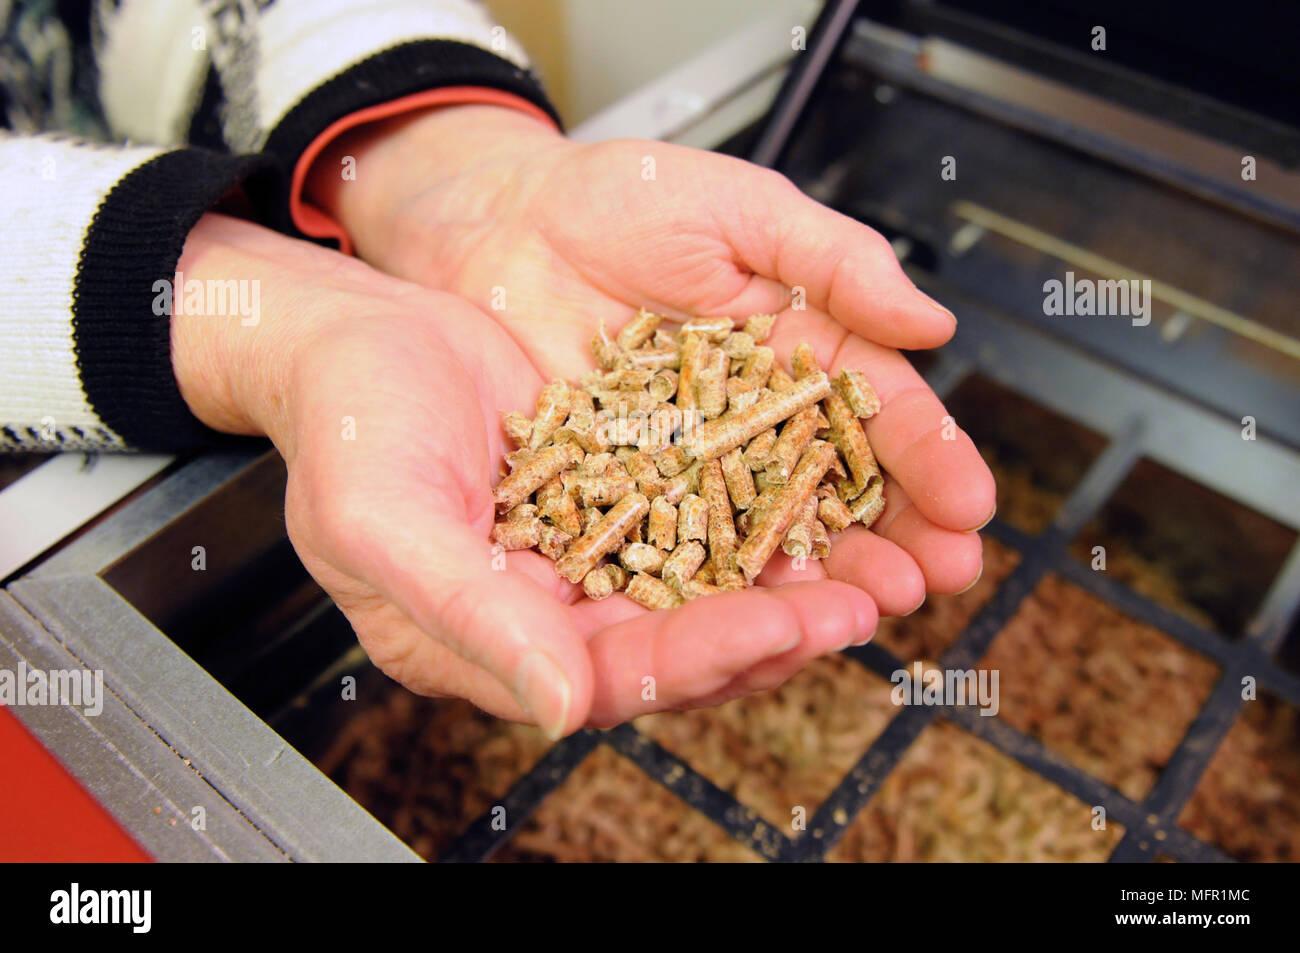 Wood Boiler Stockfotos & Wood Boiler Bilder - Alamy